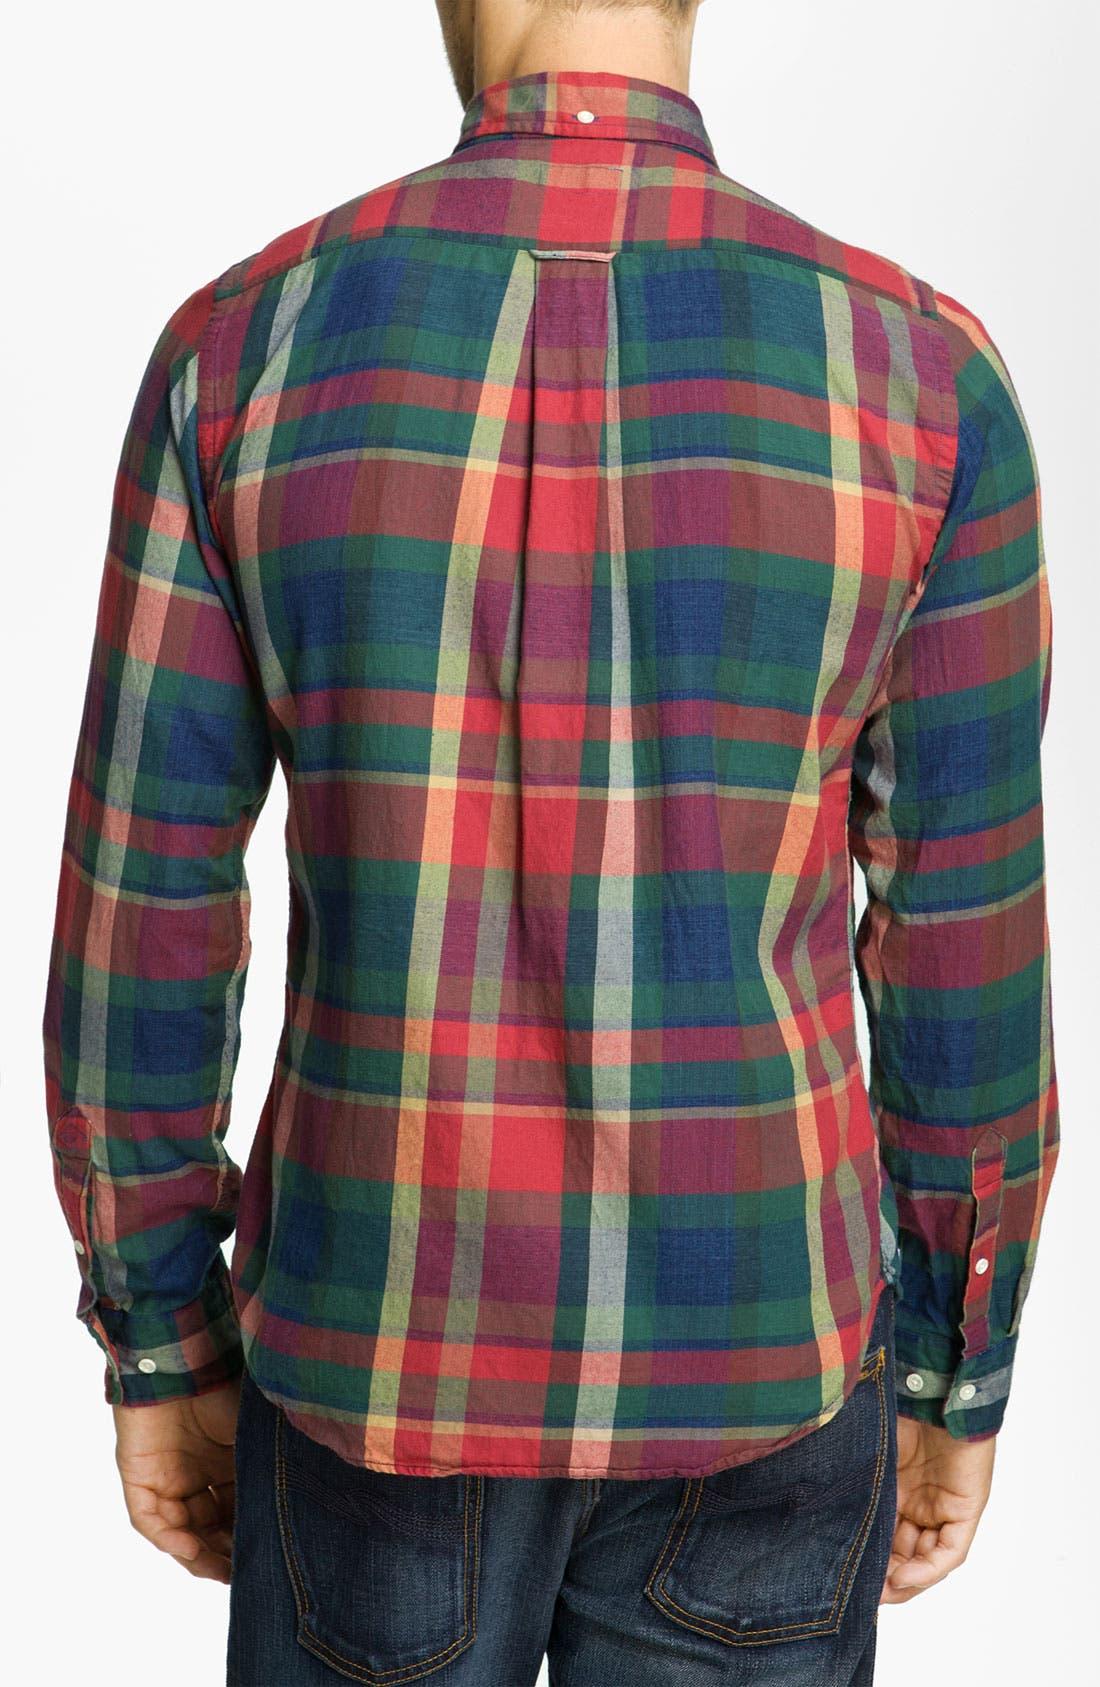 Alternate Image 2  - Gant Rugger 'Indigo' Plaid Woven Shirt